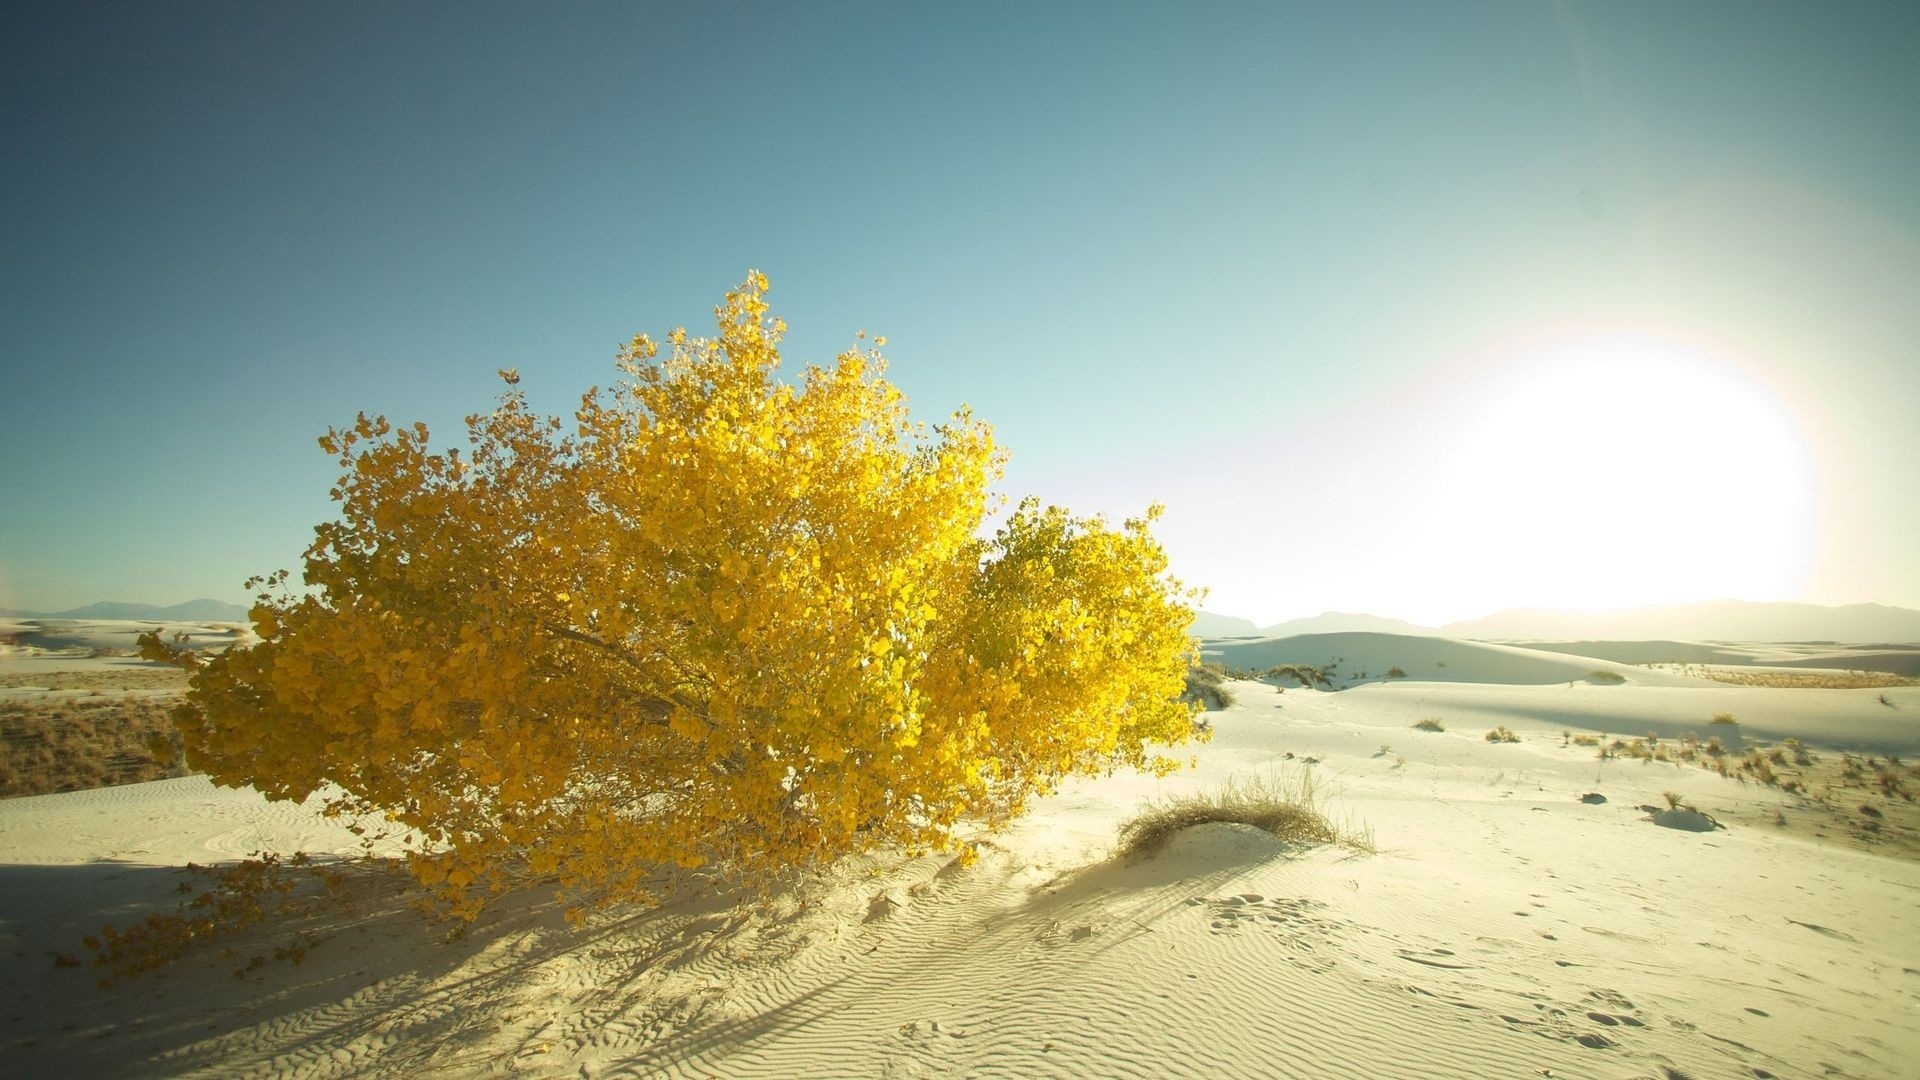 Yellow Nature hd background